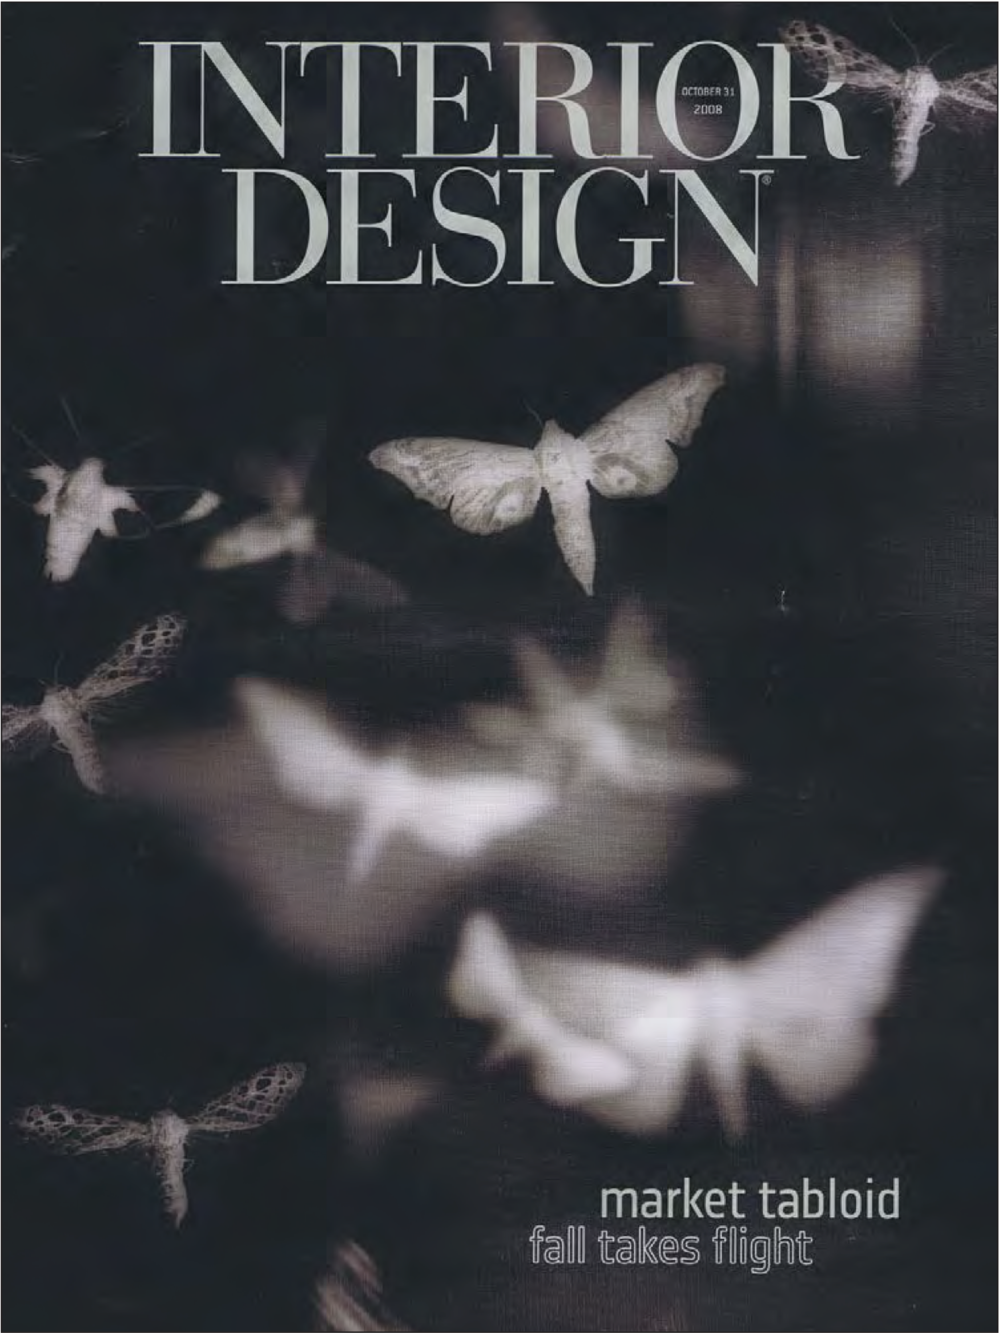 reeta-gyamlani-farrago-design-interior-design-magazine-6